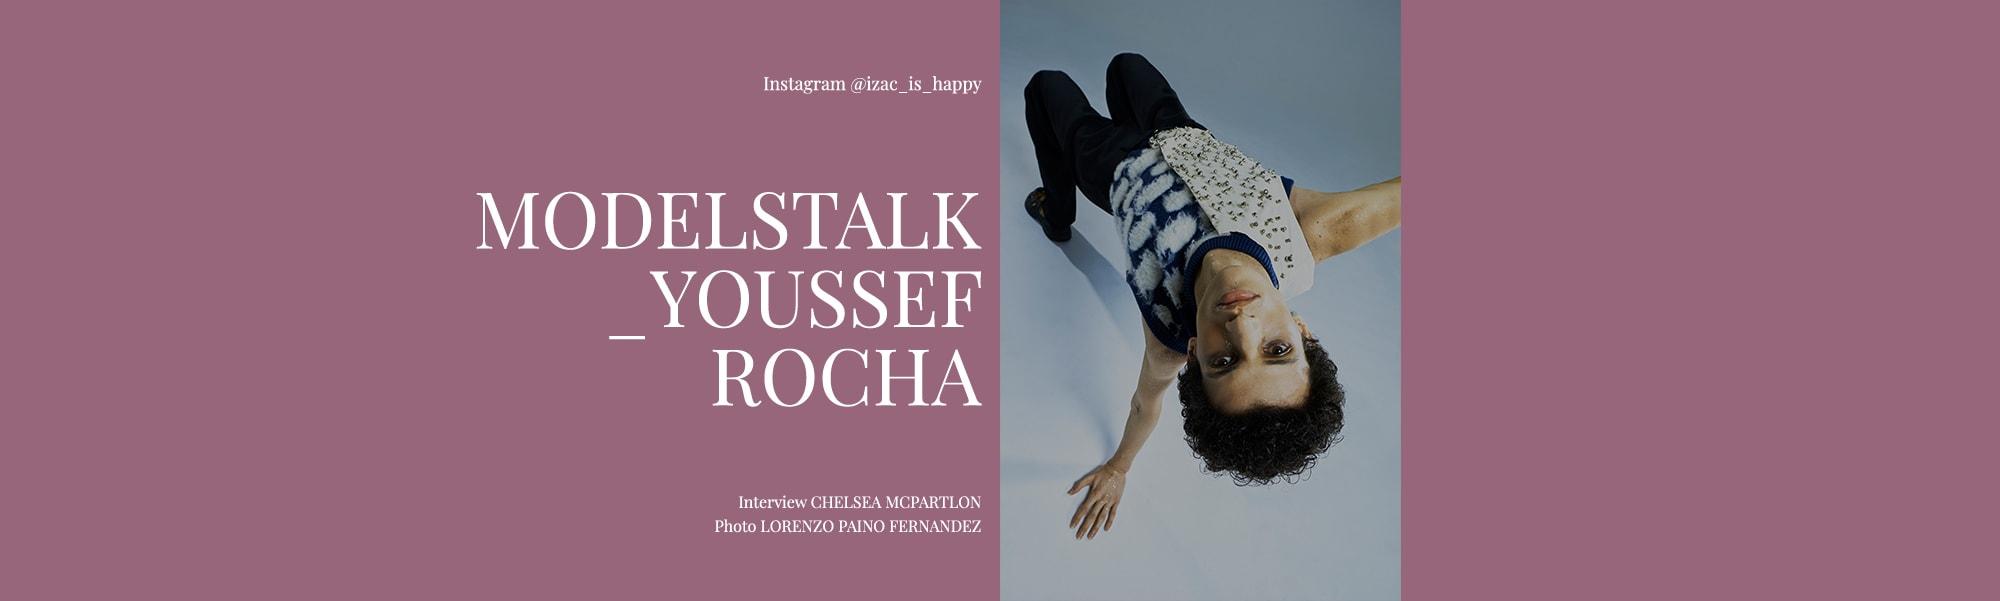 thegreatestmagazine-talking-heads-youssef-rocha-01